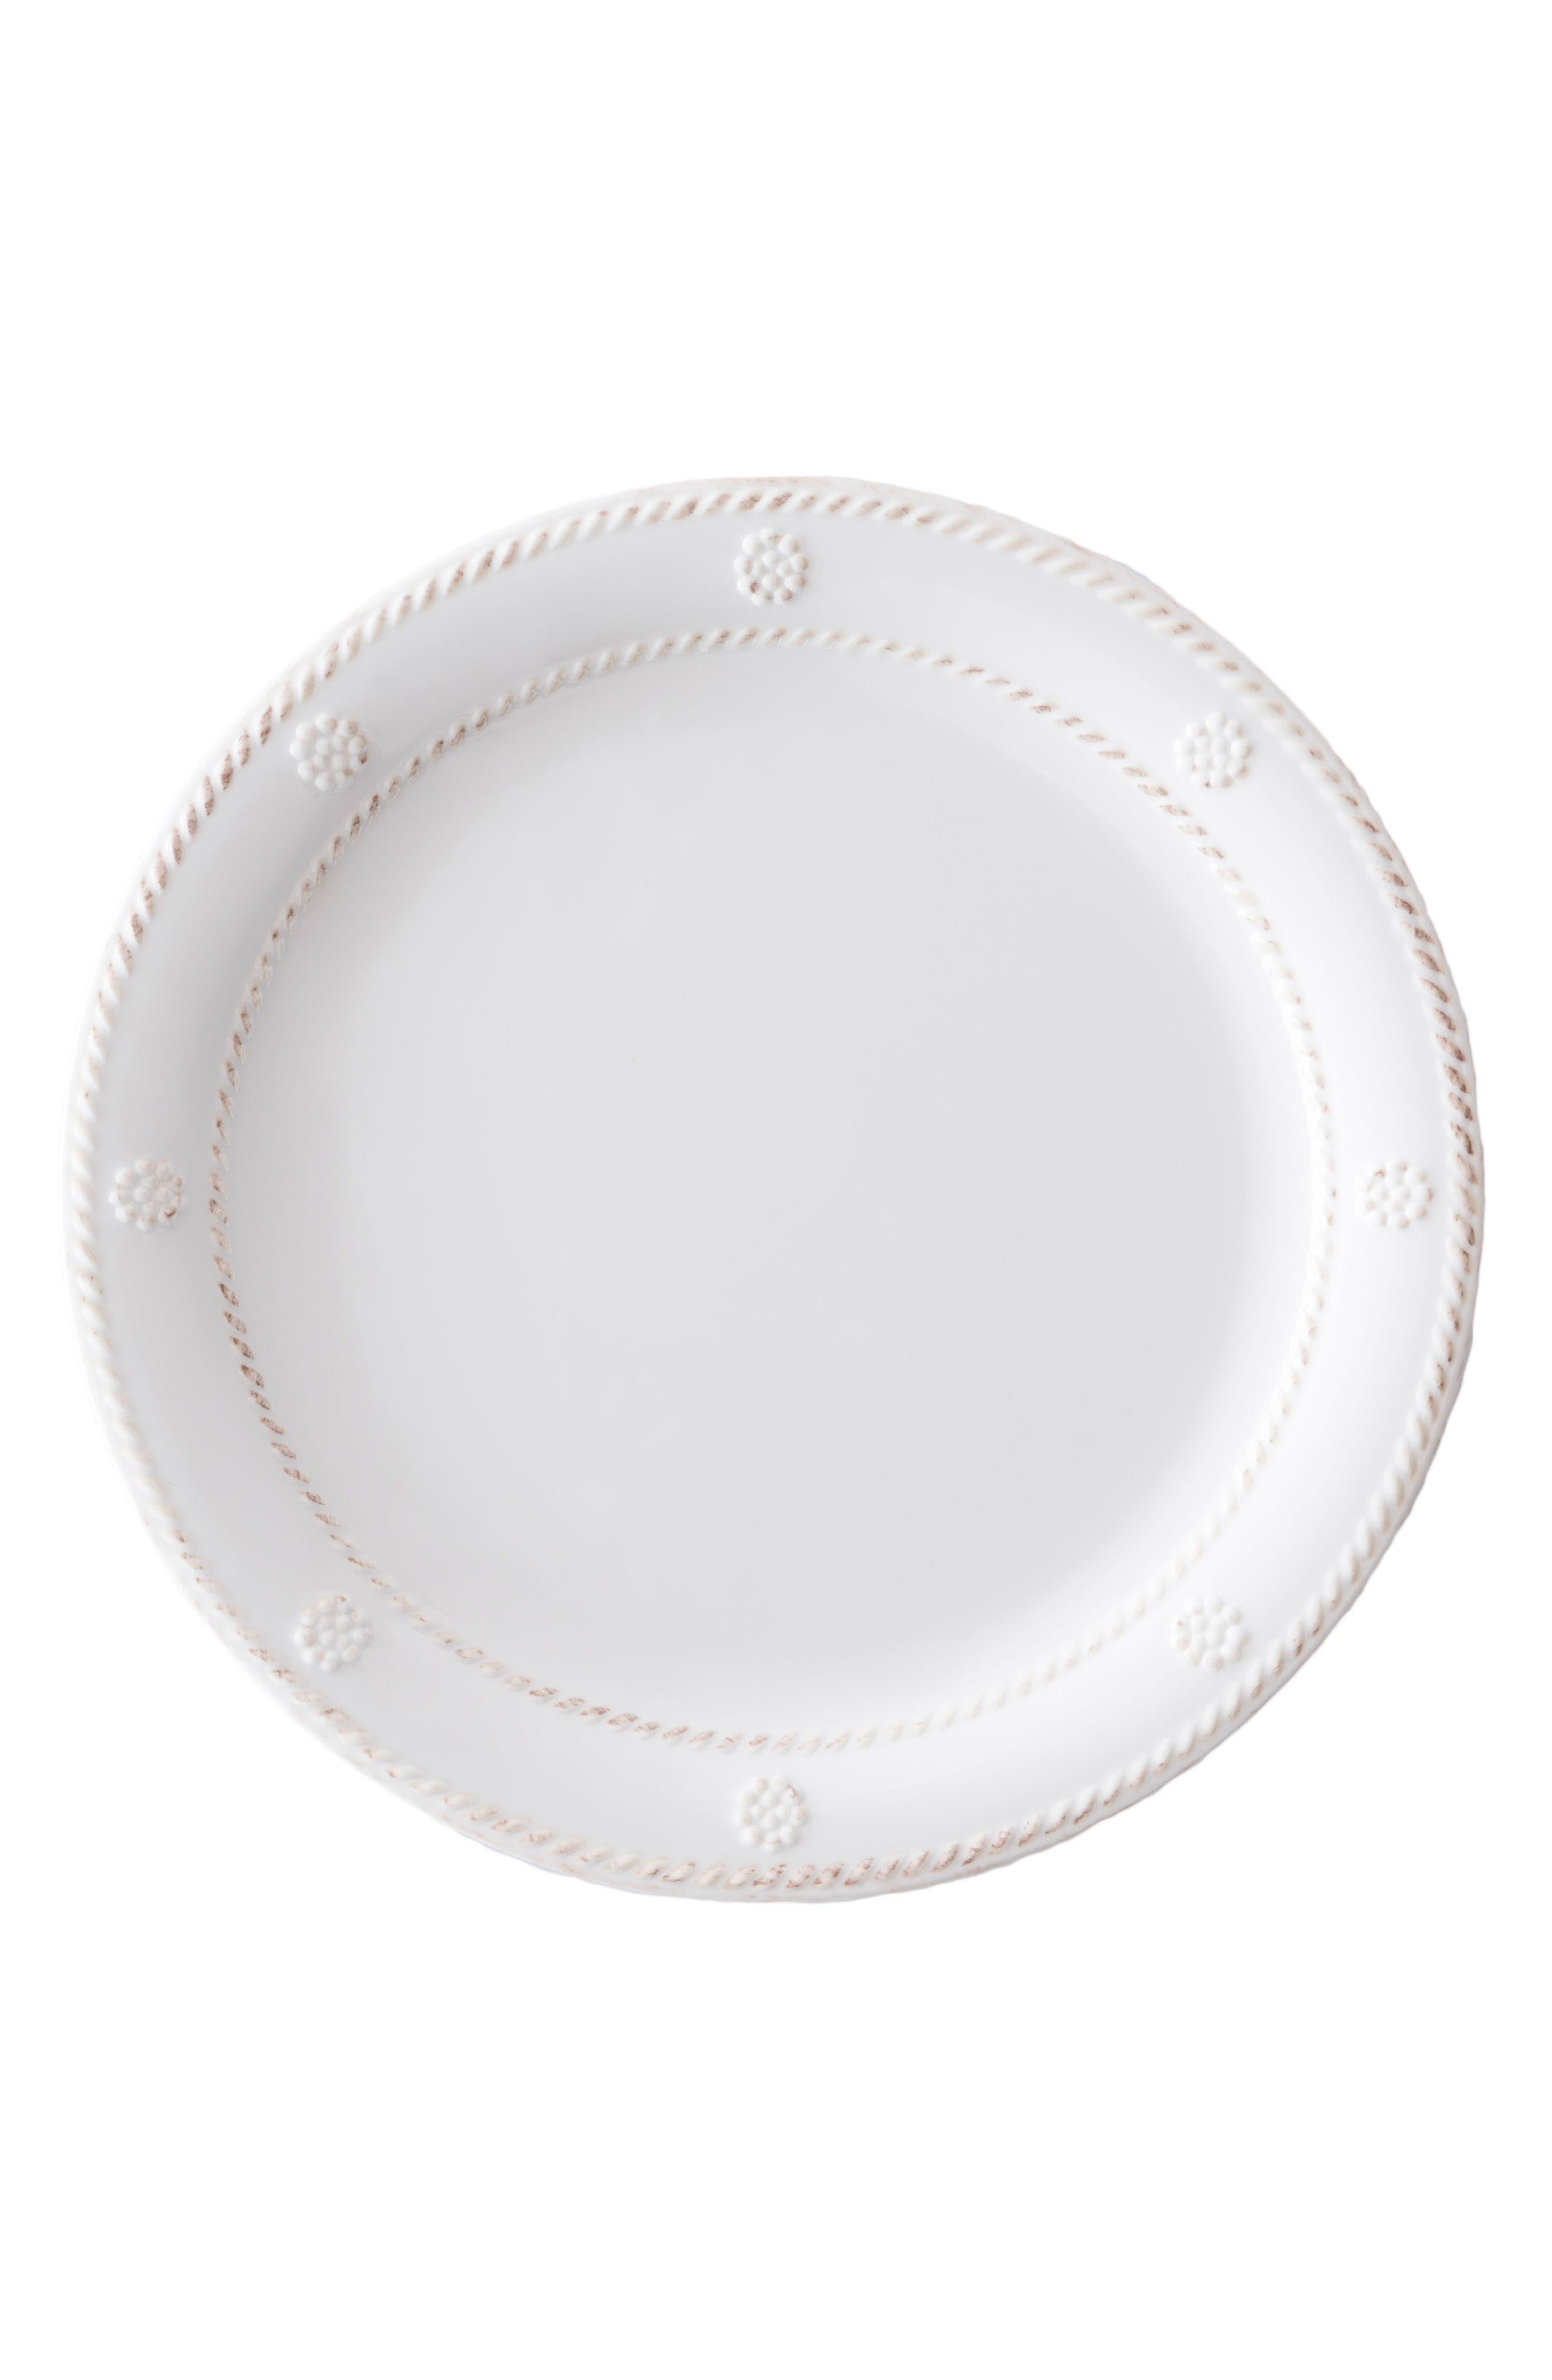 Juliska Berry & Thread Melamine Dessert Plate